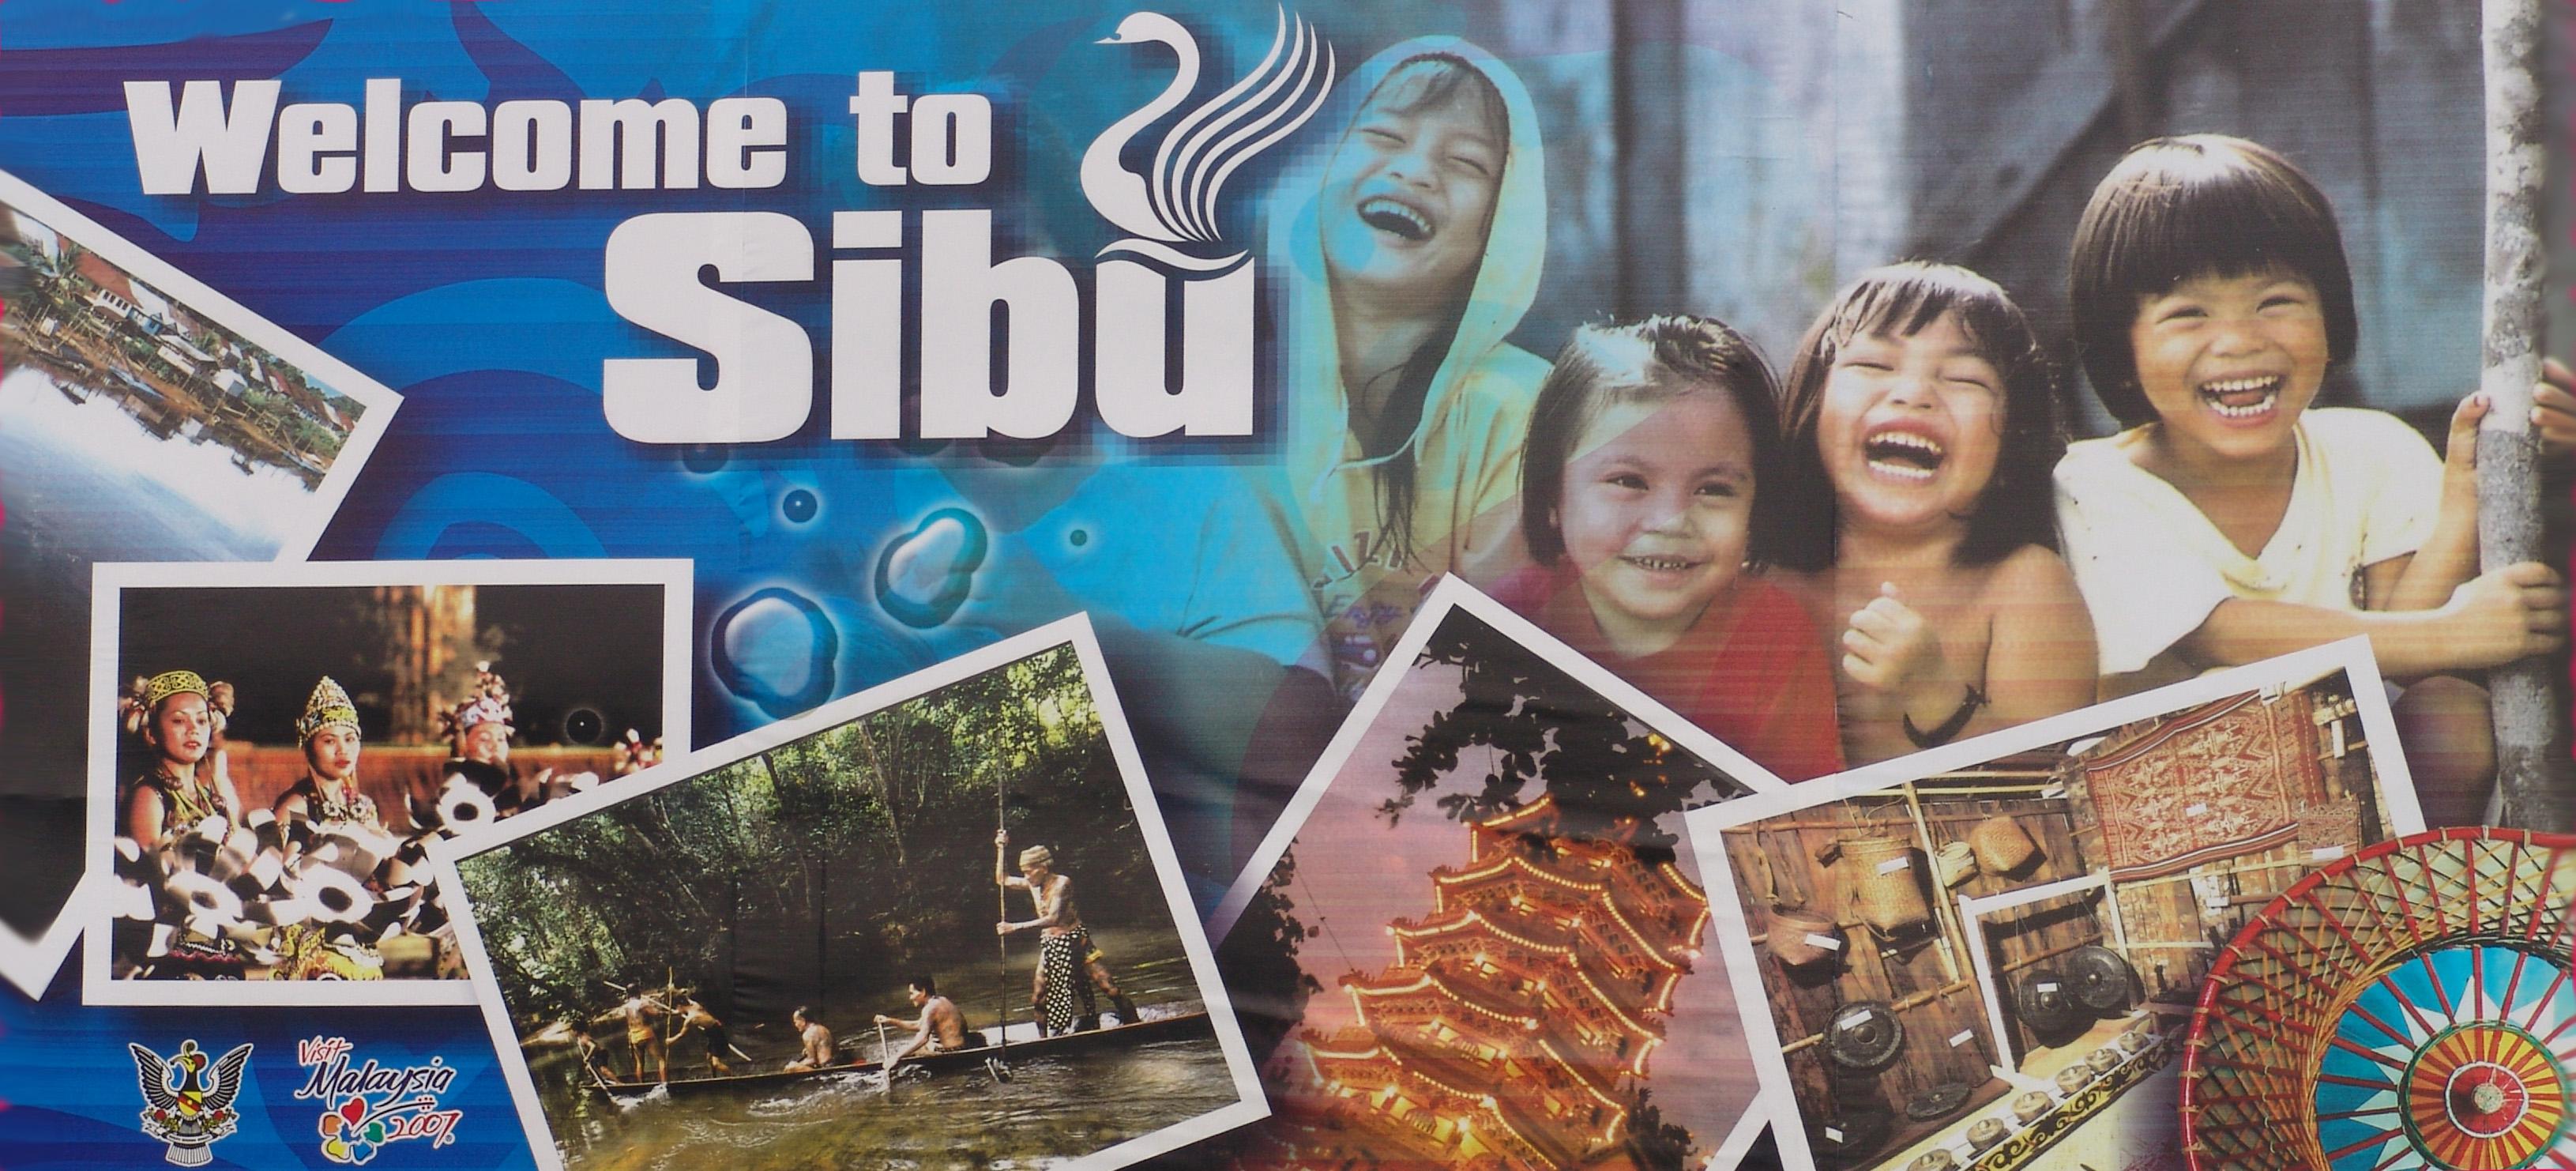 sibu-billboard